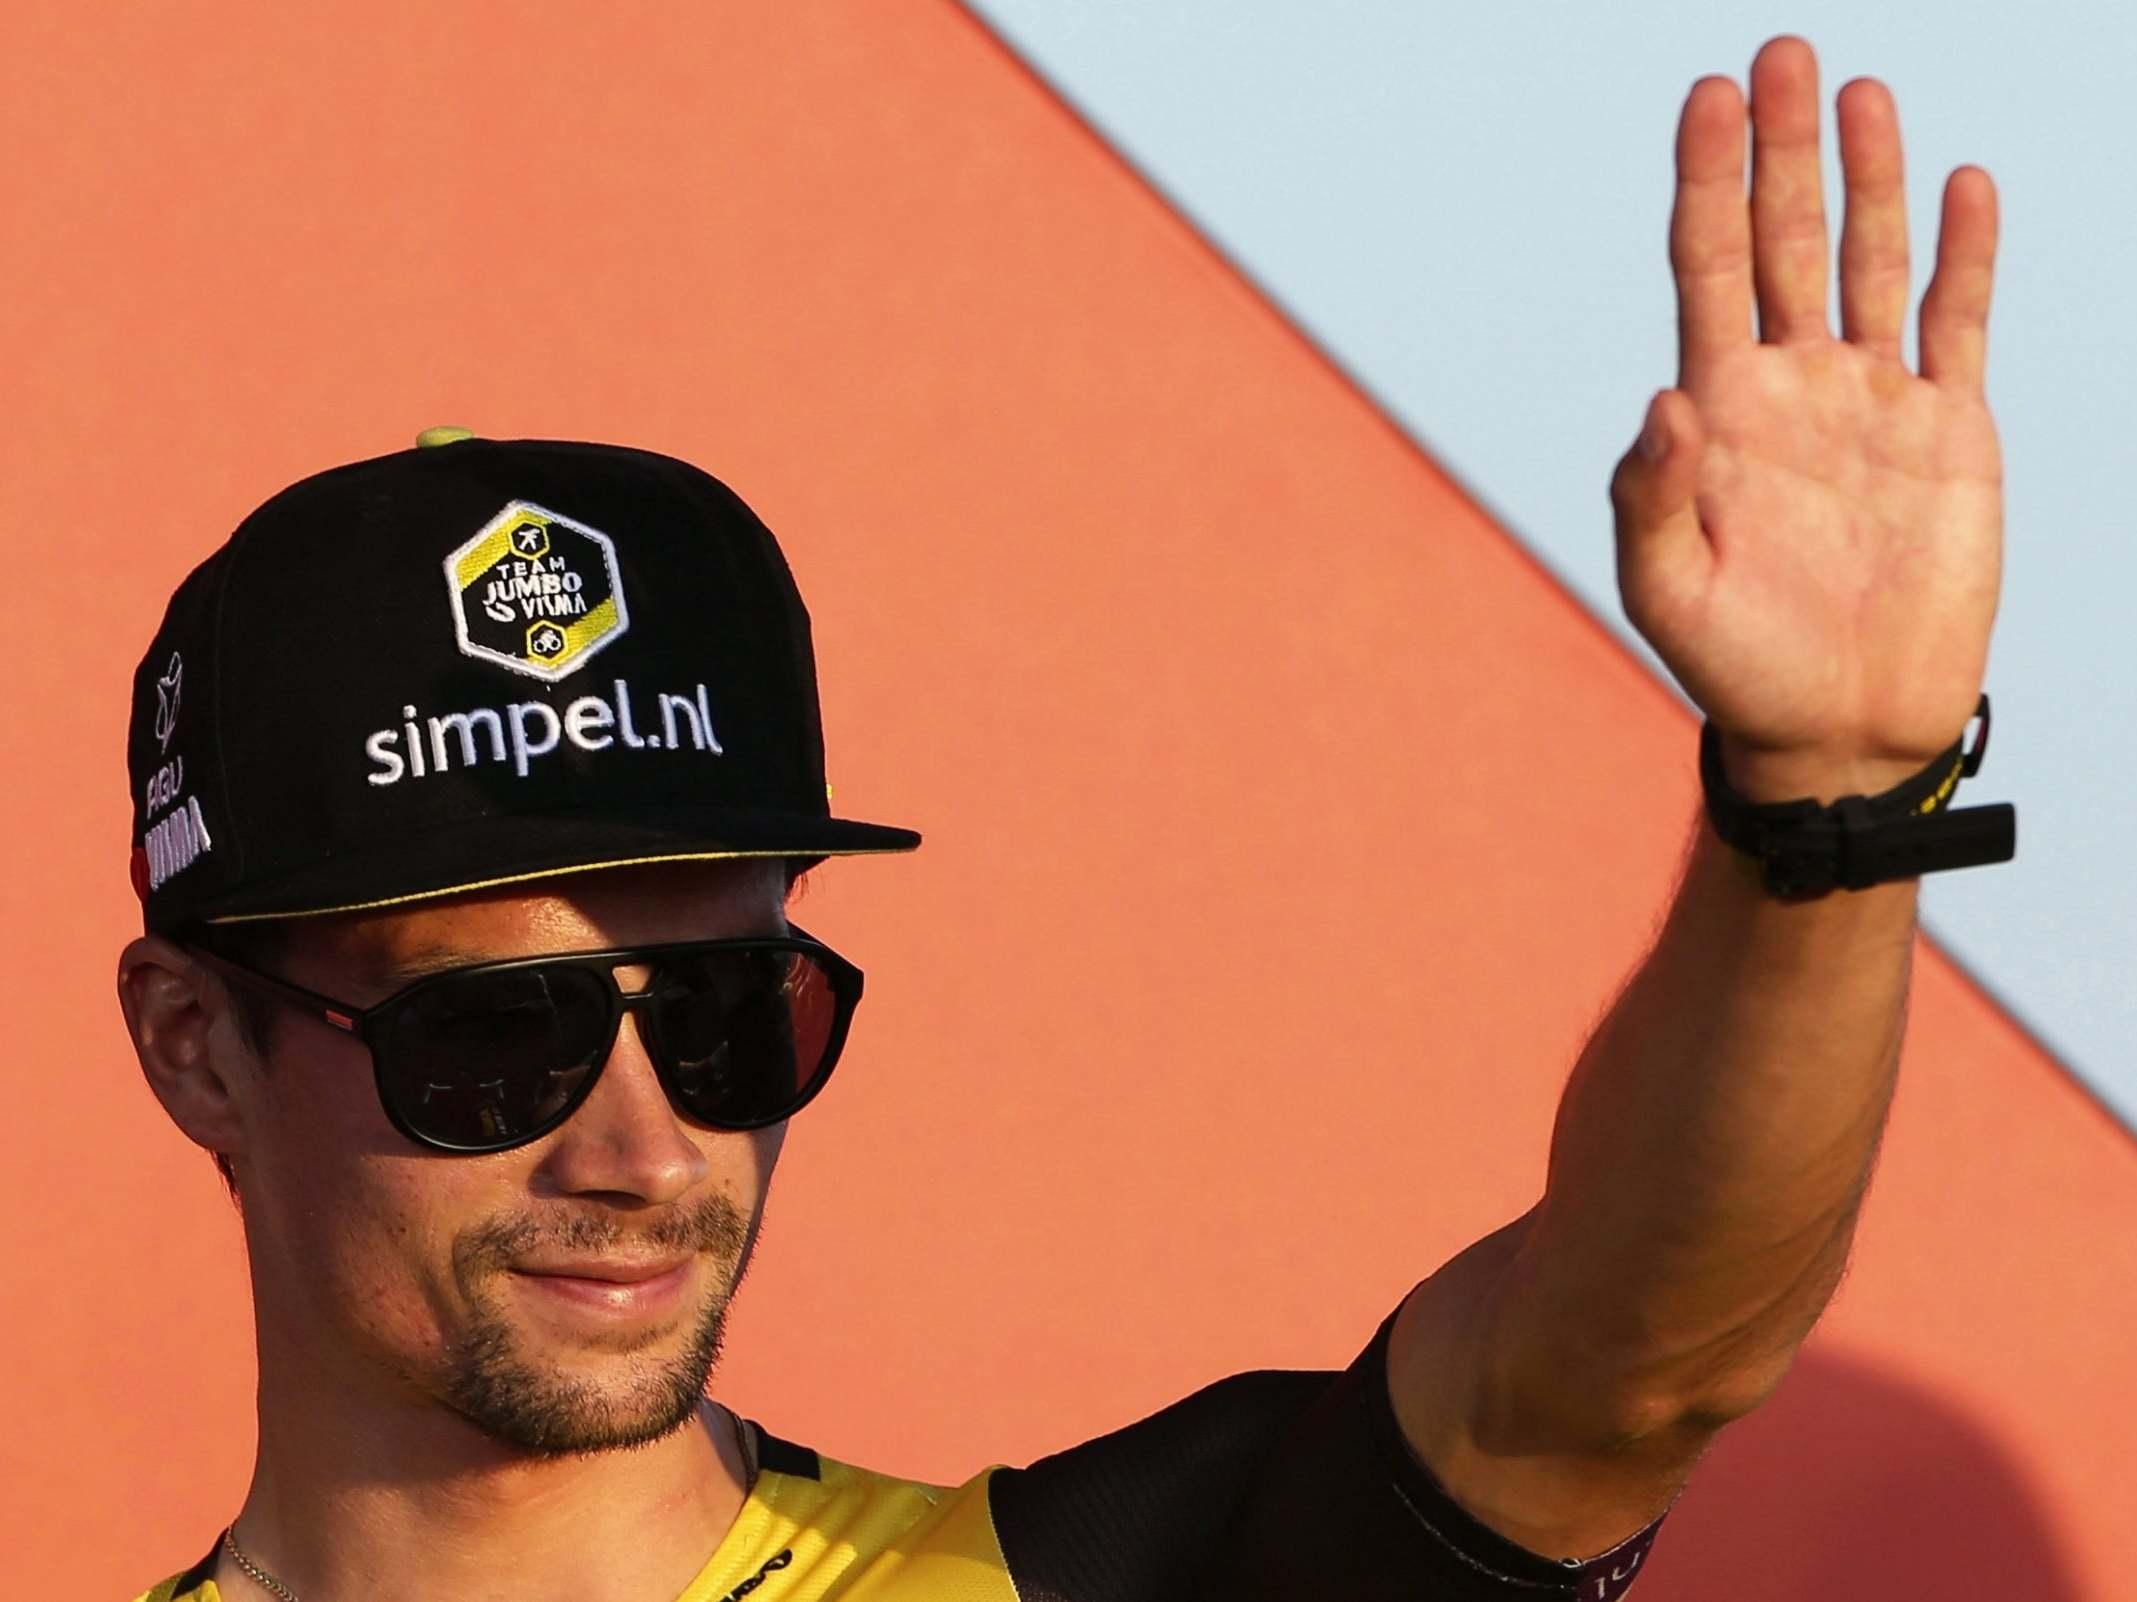 Vuelta a Espana 2019 preview: Race favourite Primoz Roglic can lay marker in Jumbo Visma's rivalry with Ineos